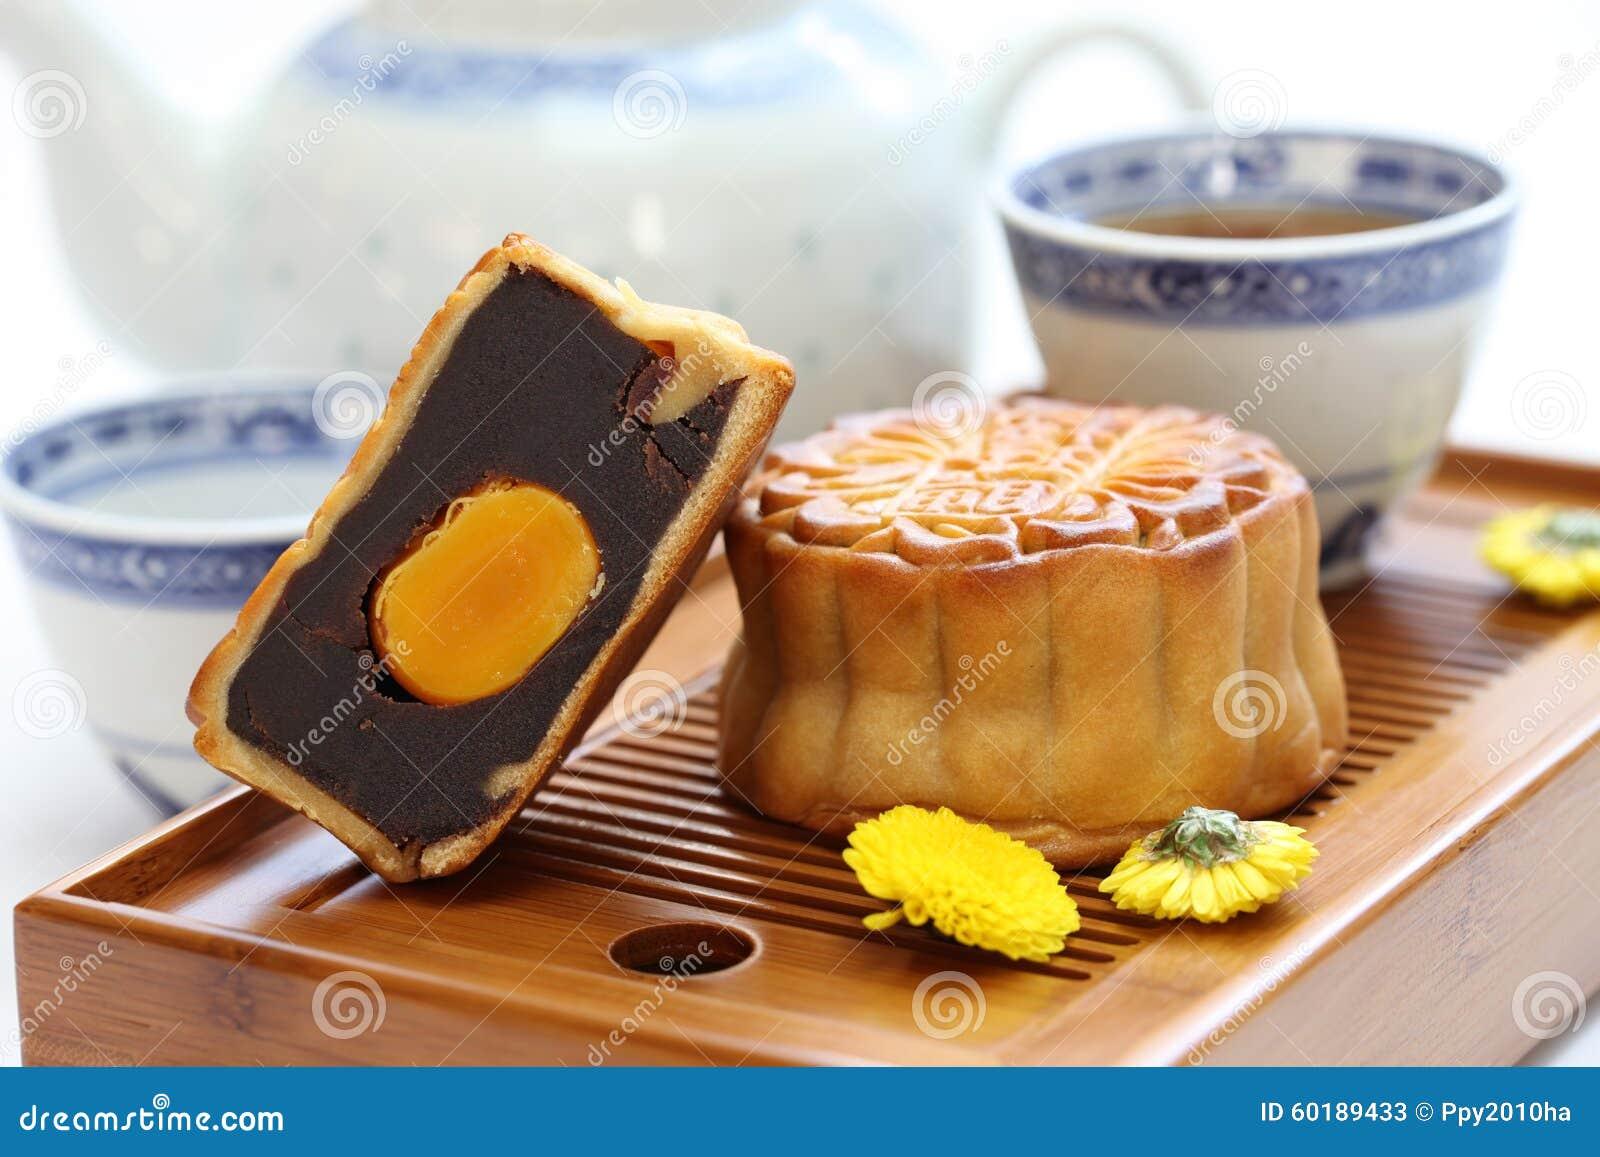 Mooncake, moon cake